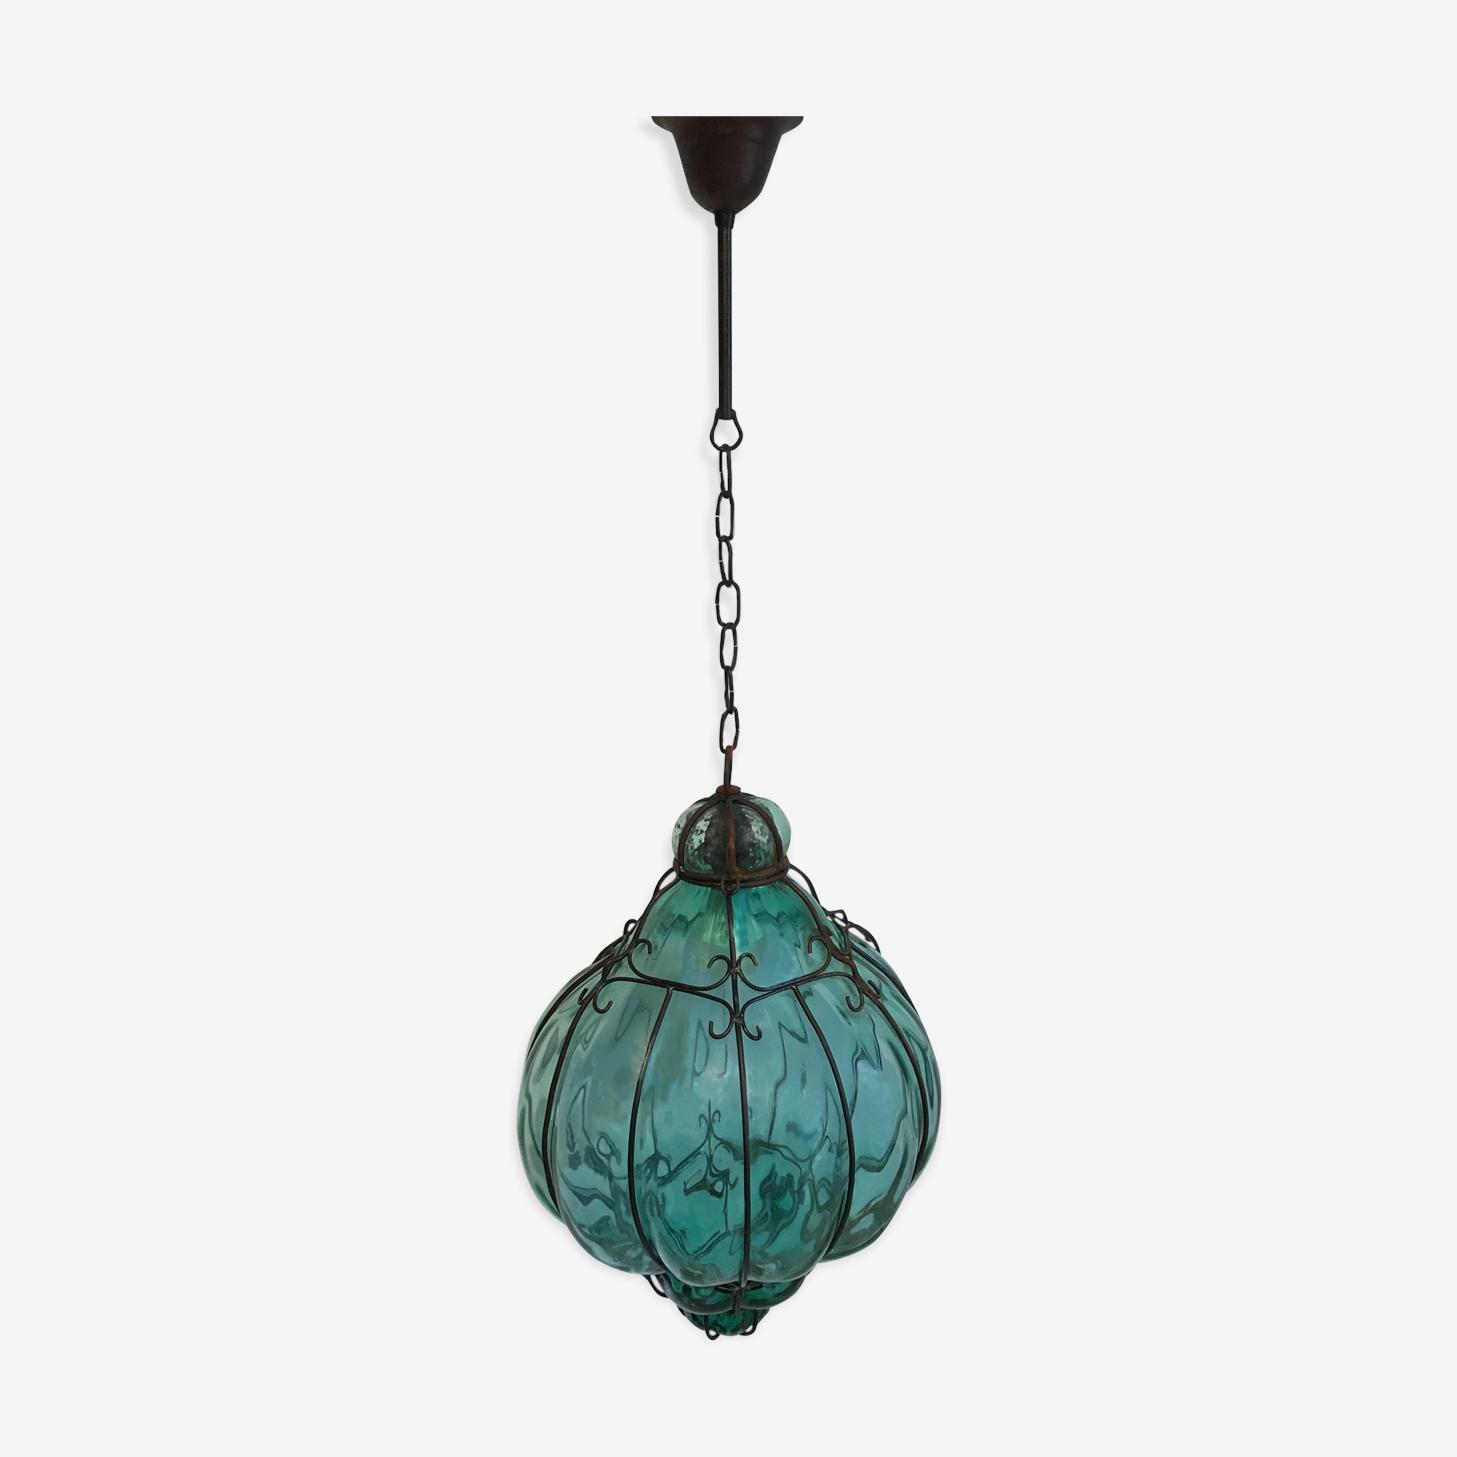 Large Murano blown glass Lantern